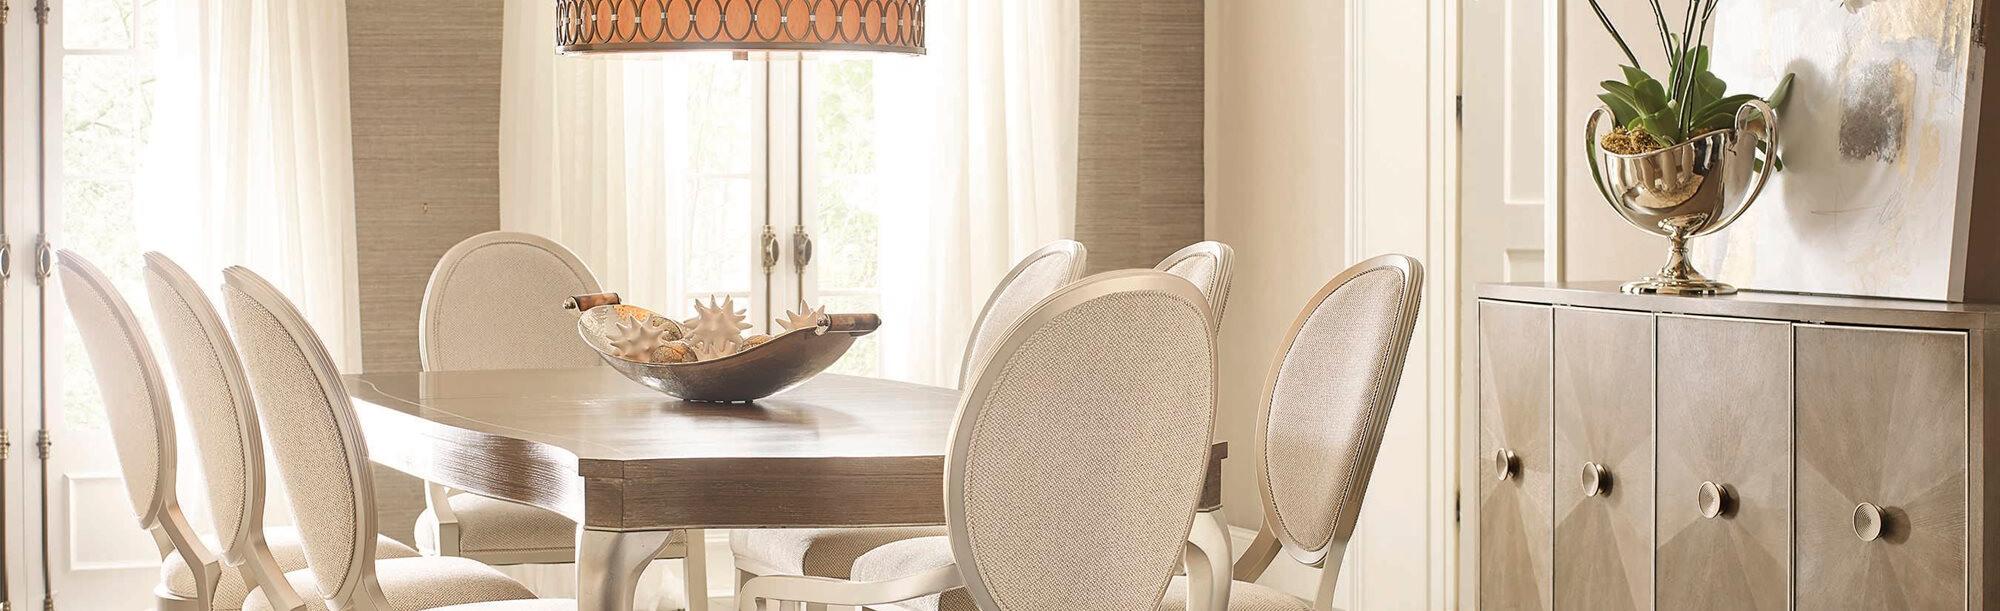 Luxury Home Decor Shopping For Indoor Outdoor Luxedecor